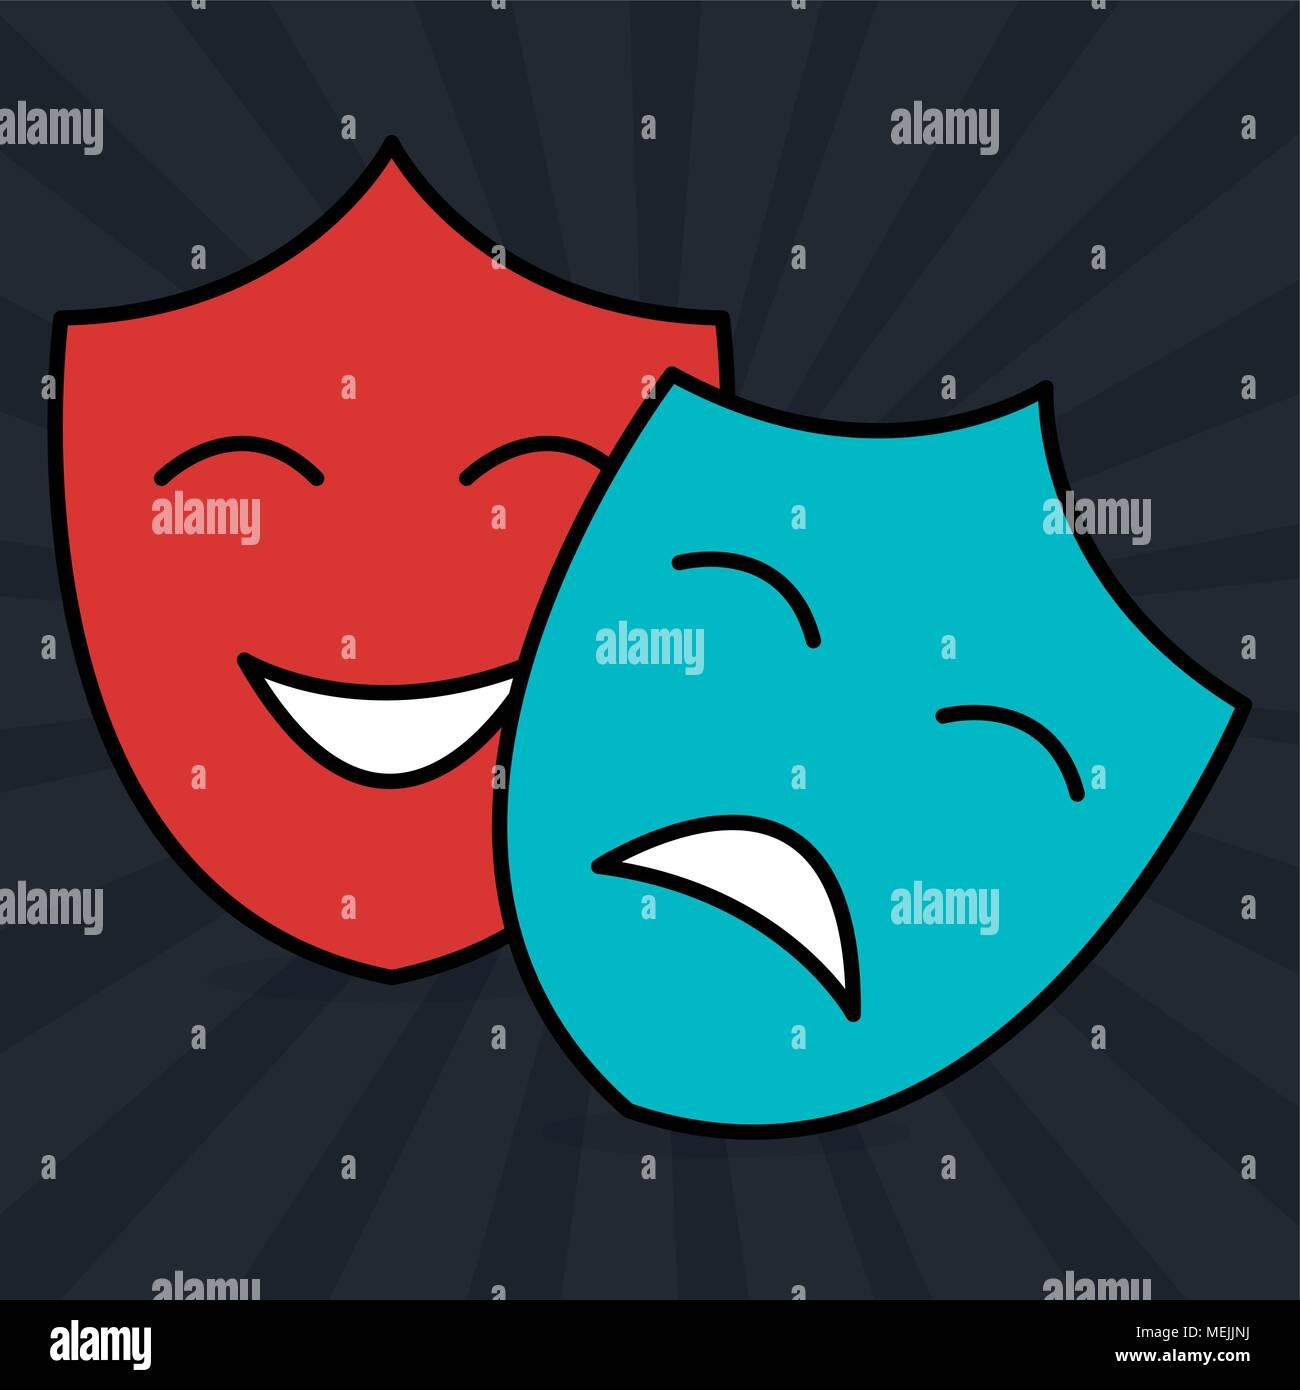 cinema theatrical mask entertainment icon - Stock Image